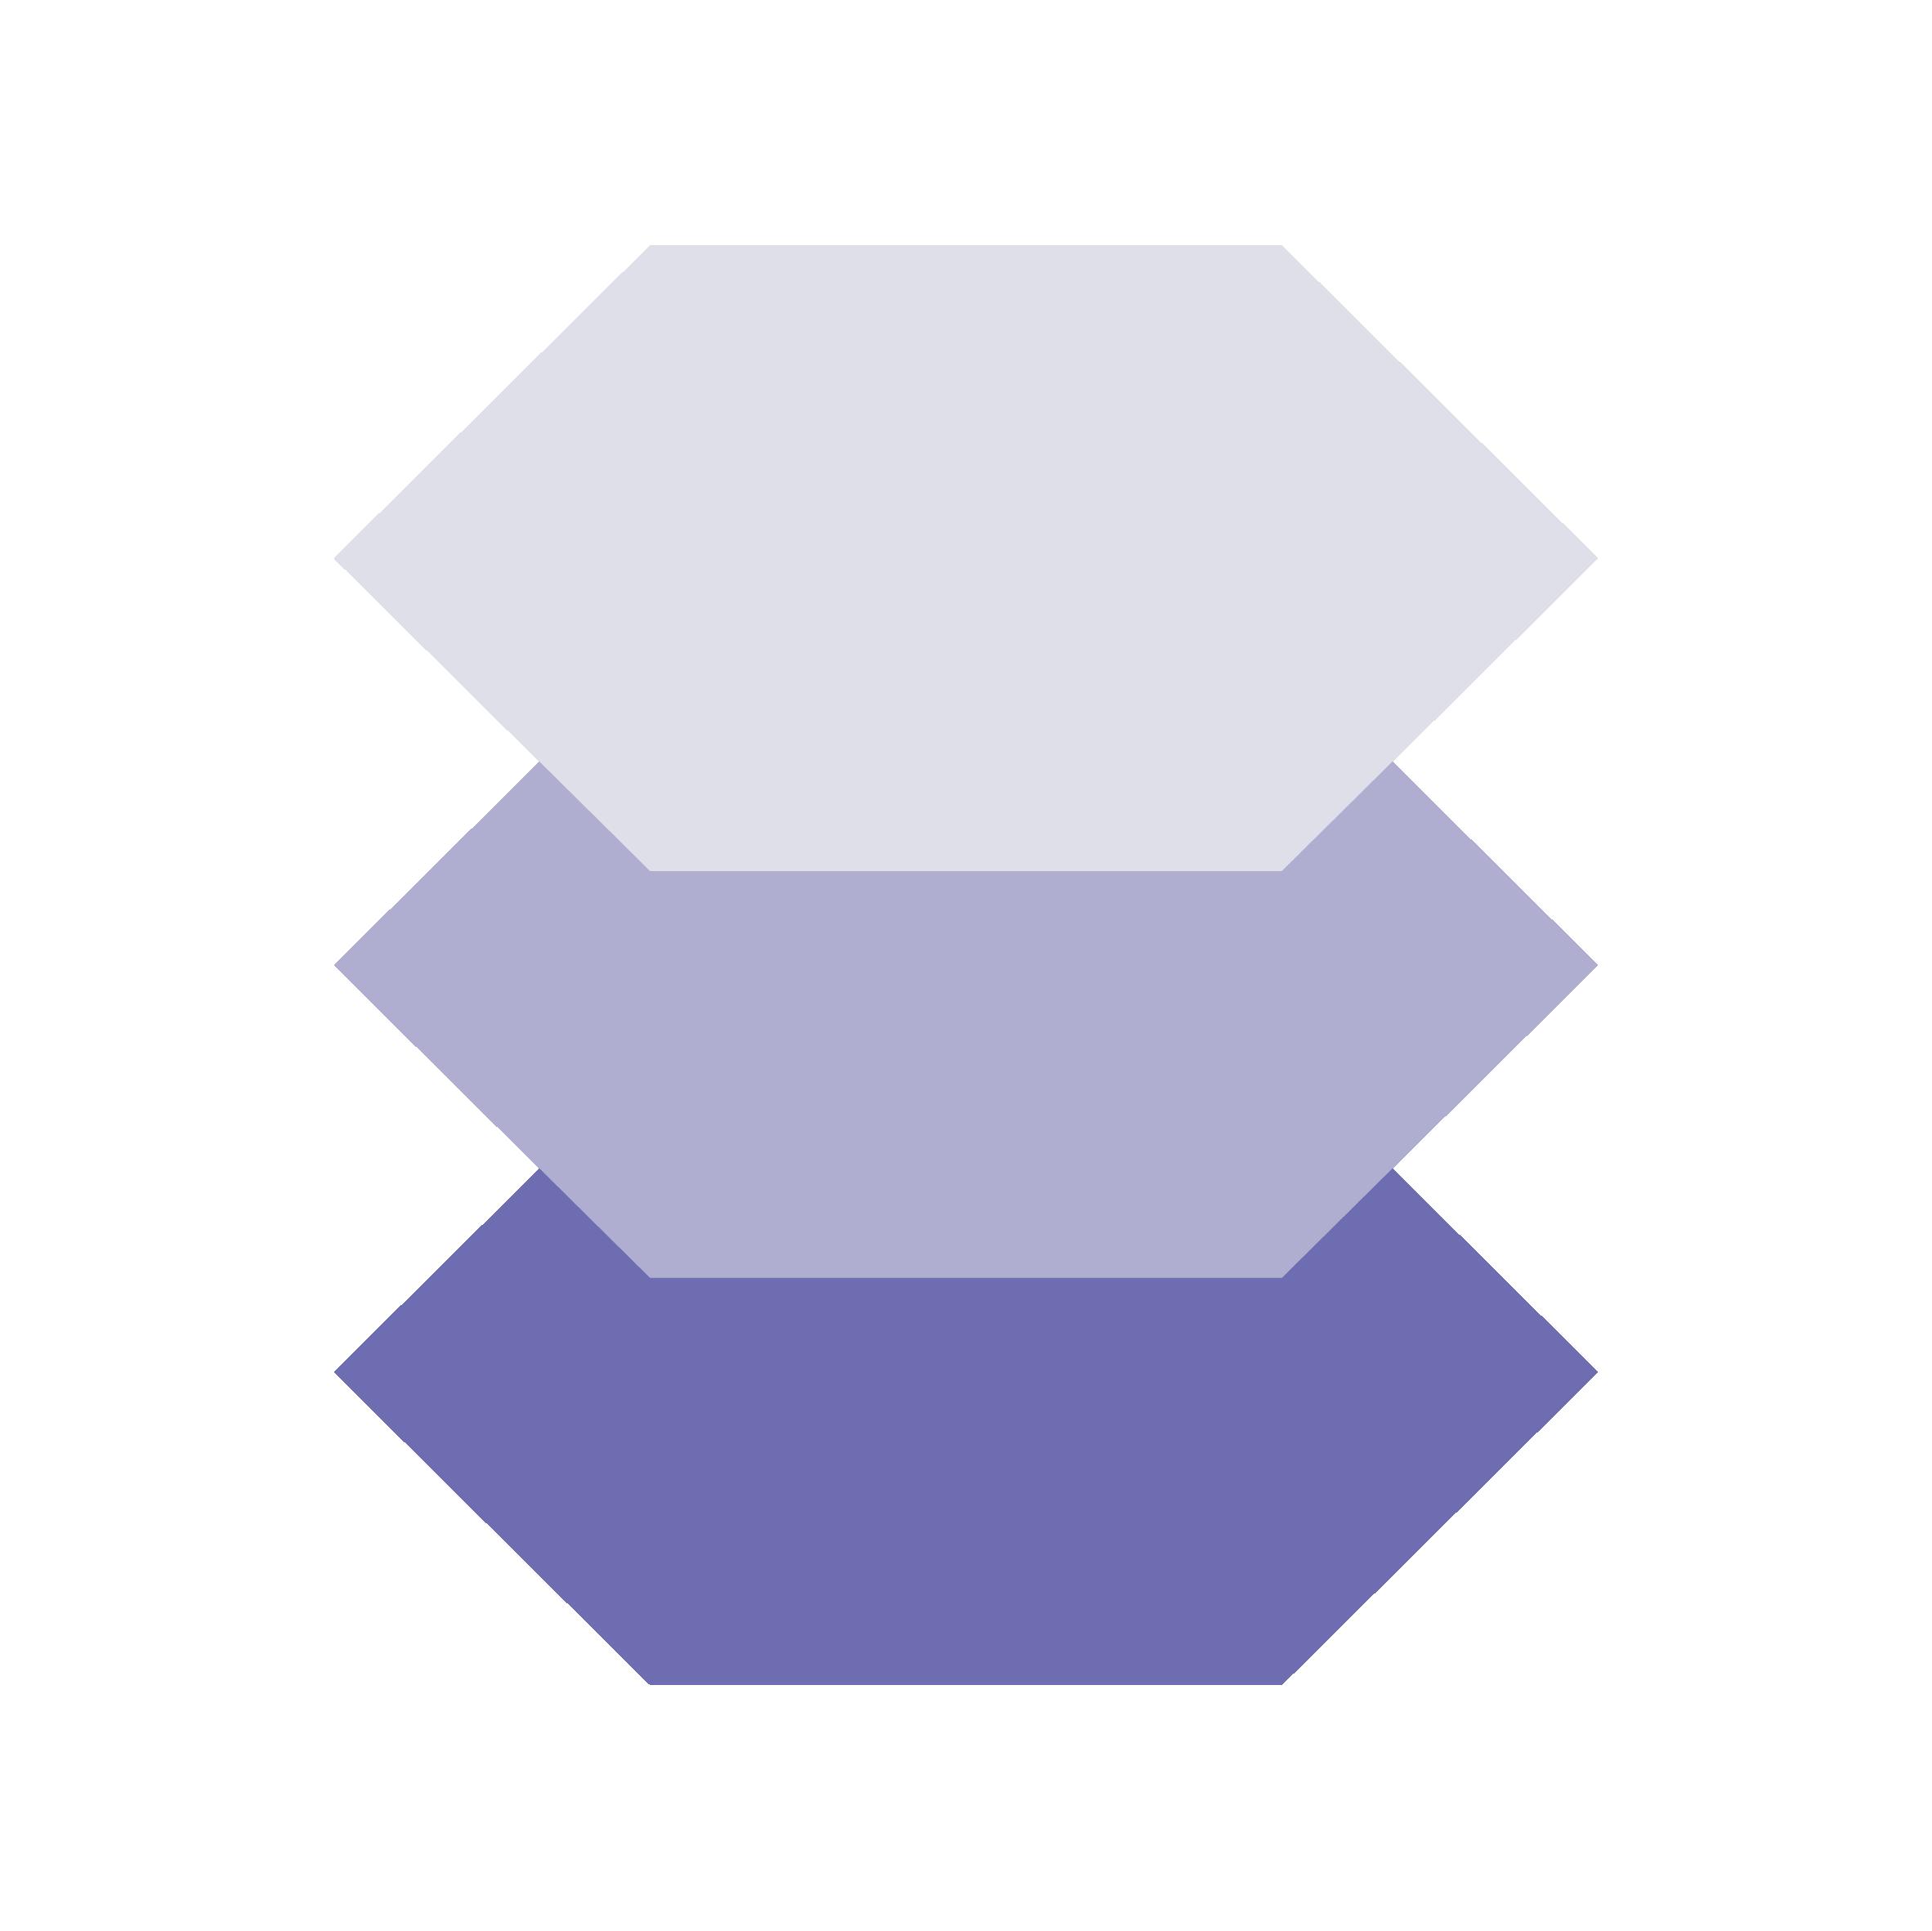 Sales network icon